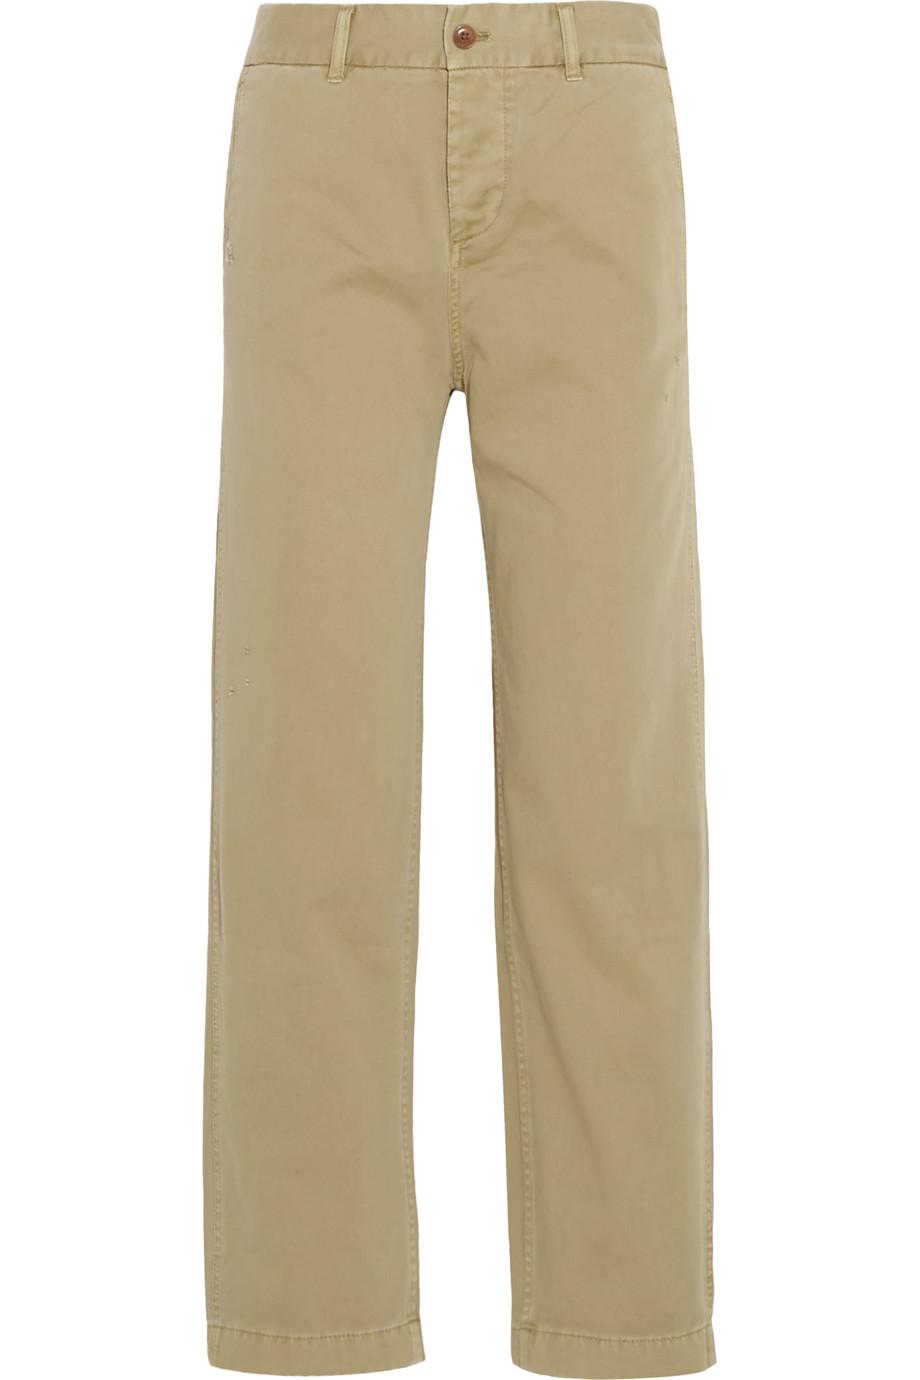 J.Crew Cotton-Twill Straight-Leg Pants, Camel, Women's, Size: 6